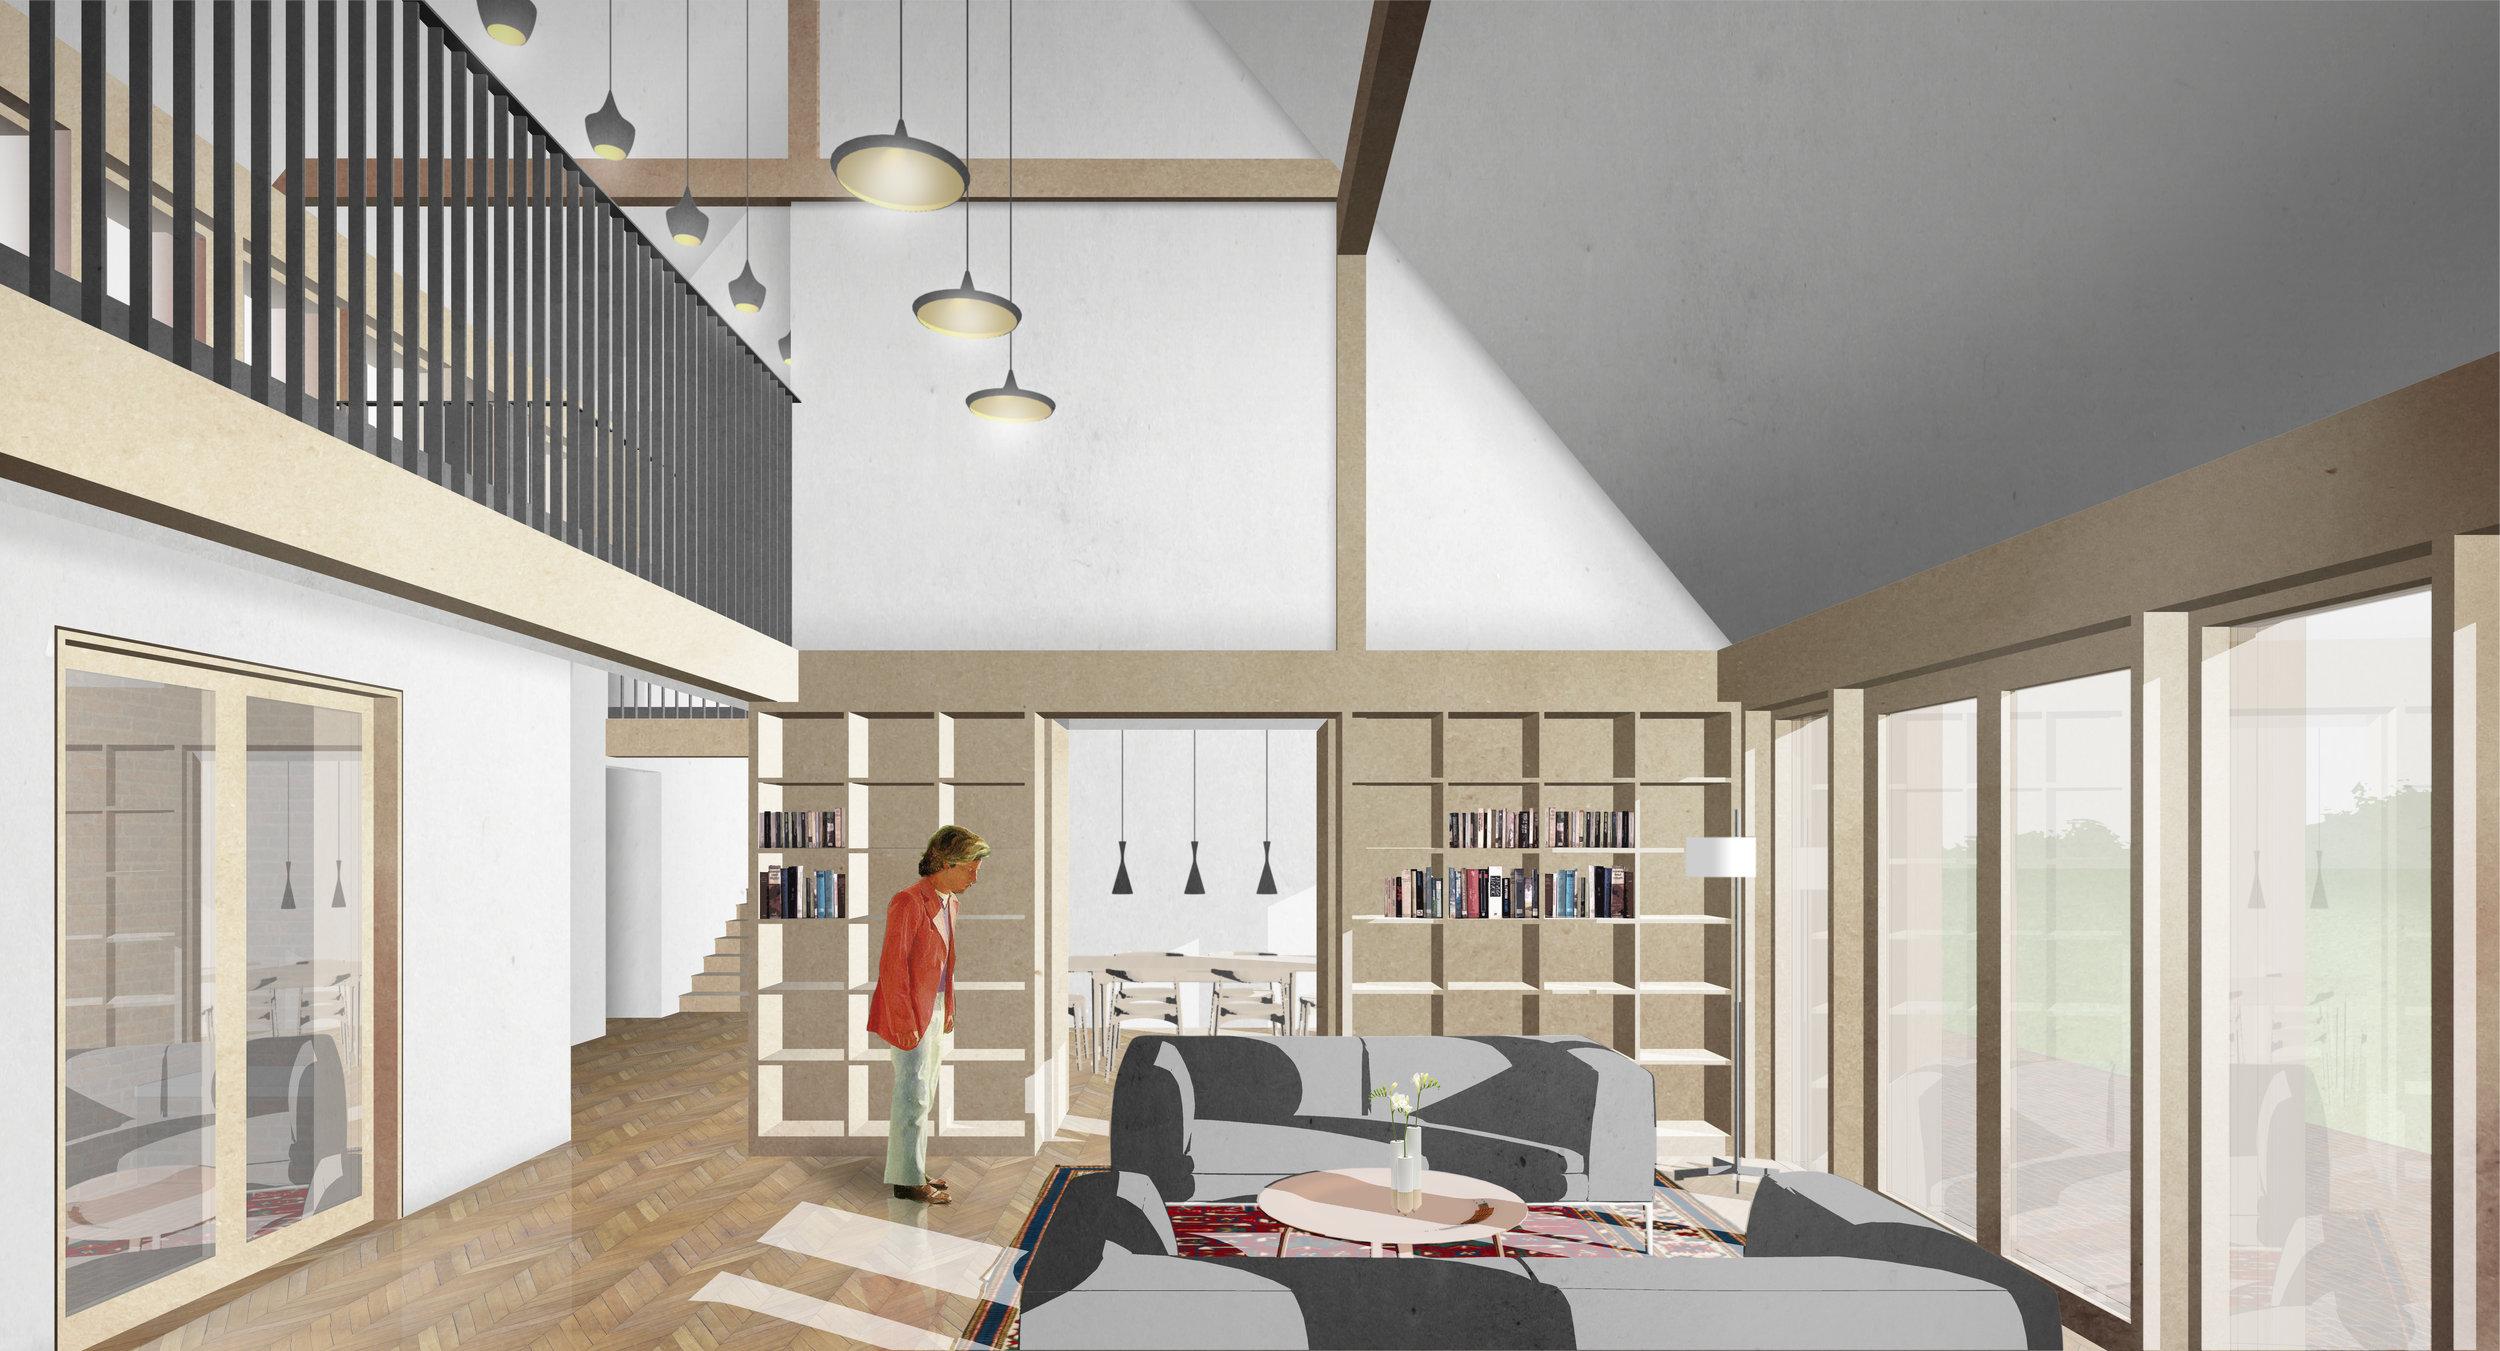 Vernacular House Interior.jpg